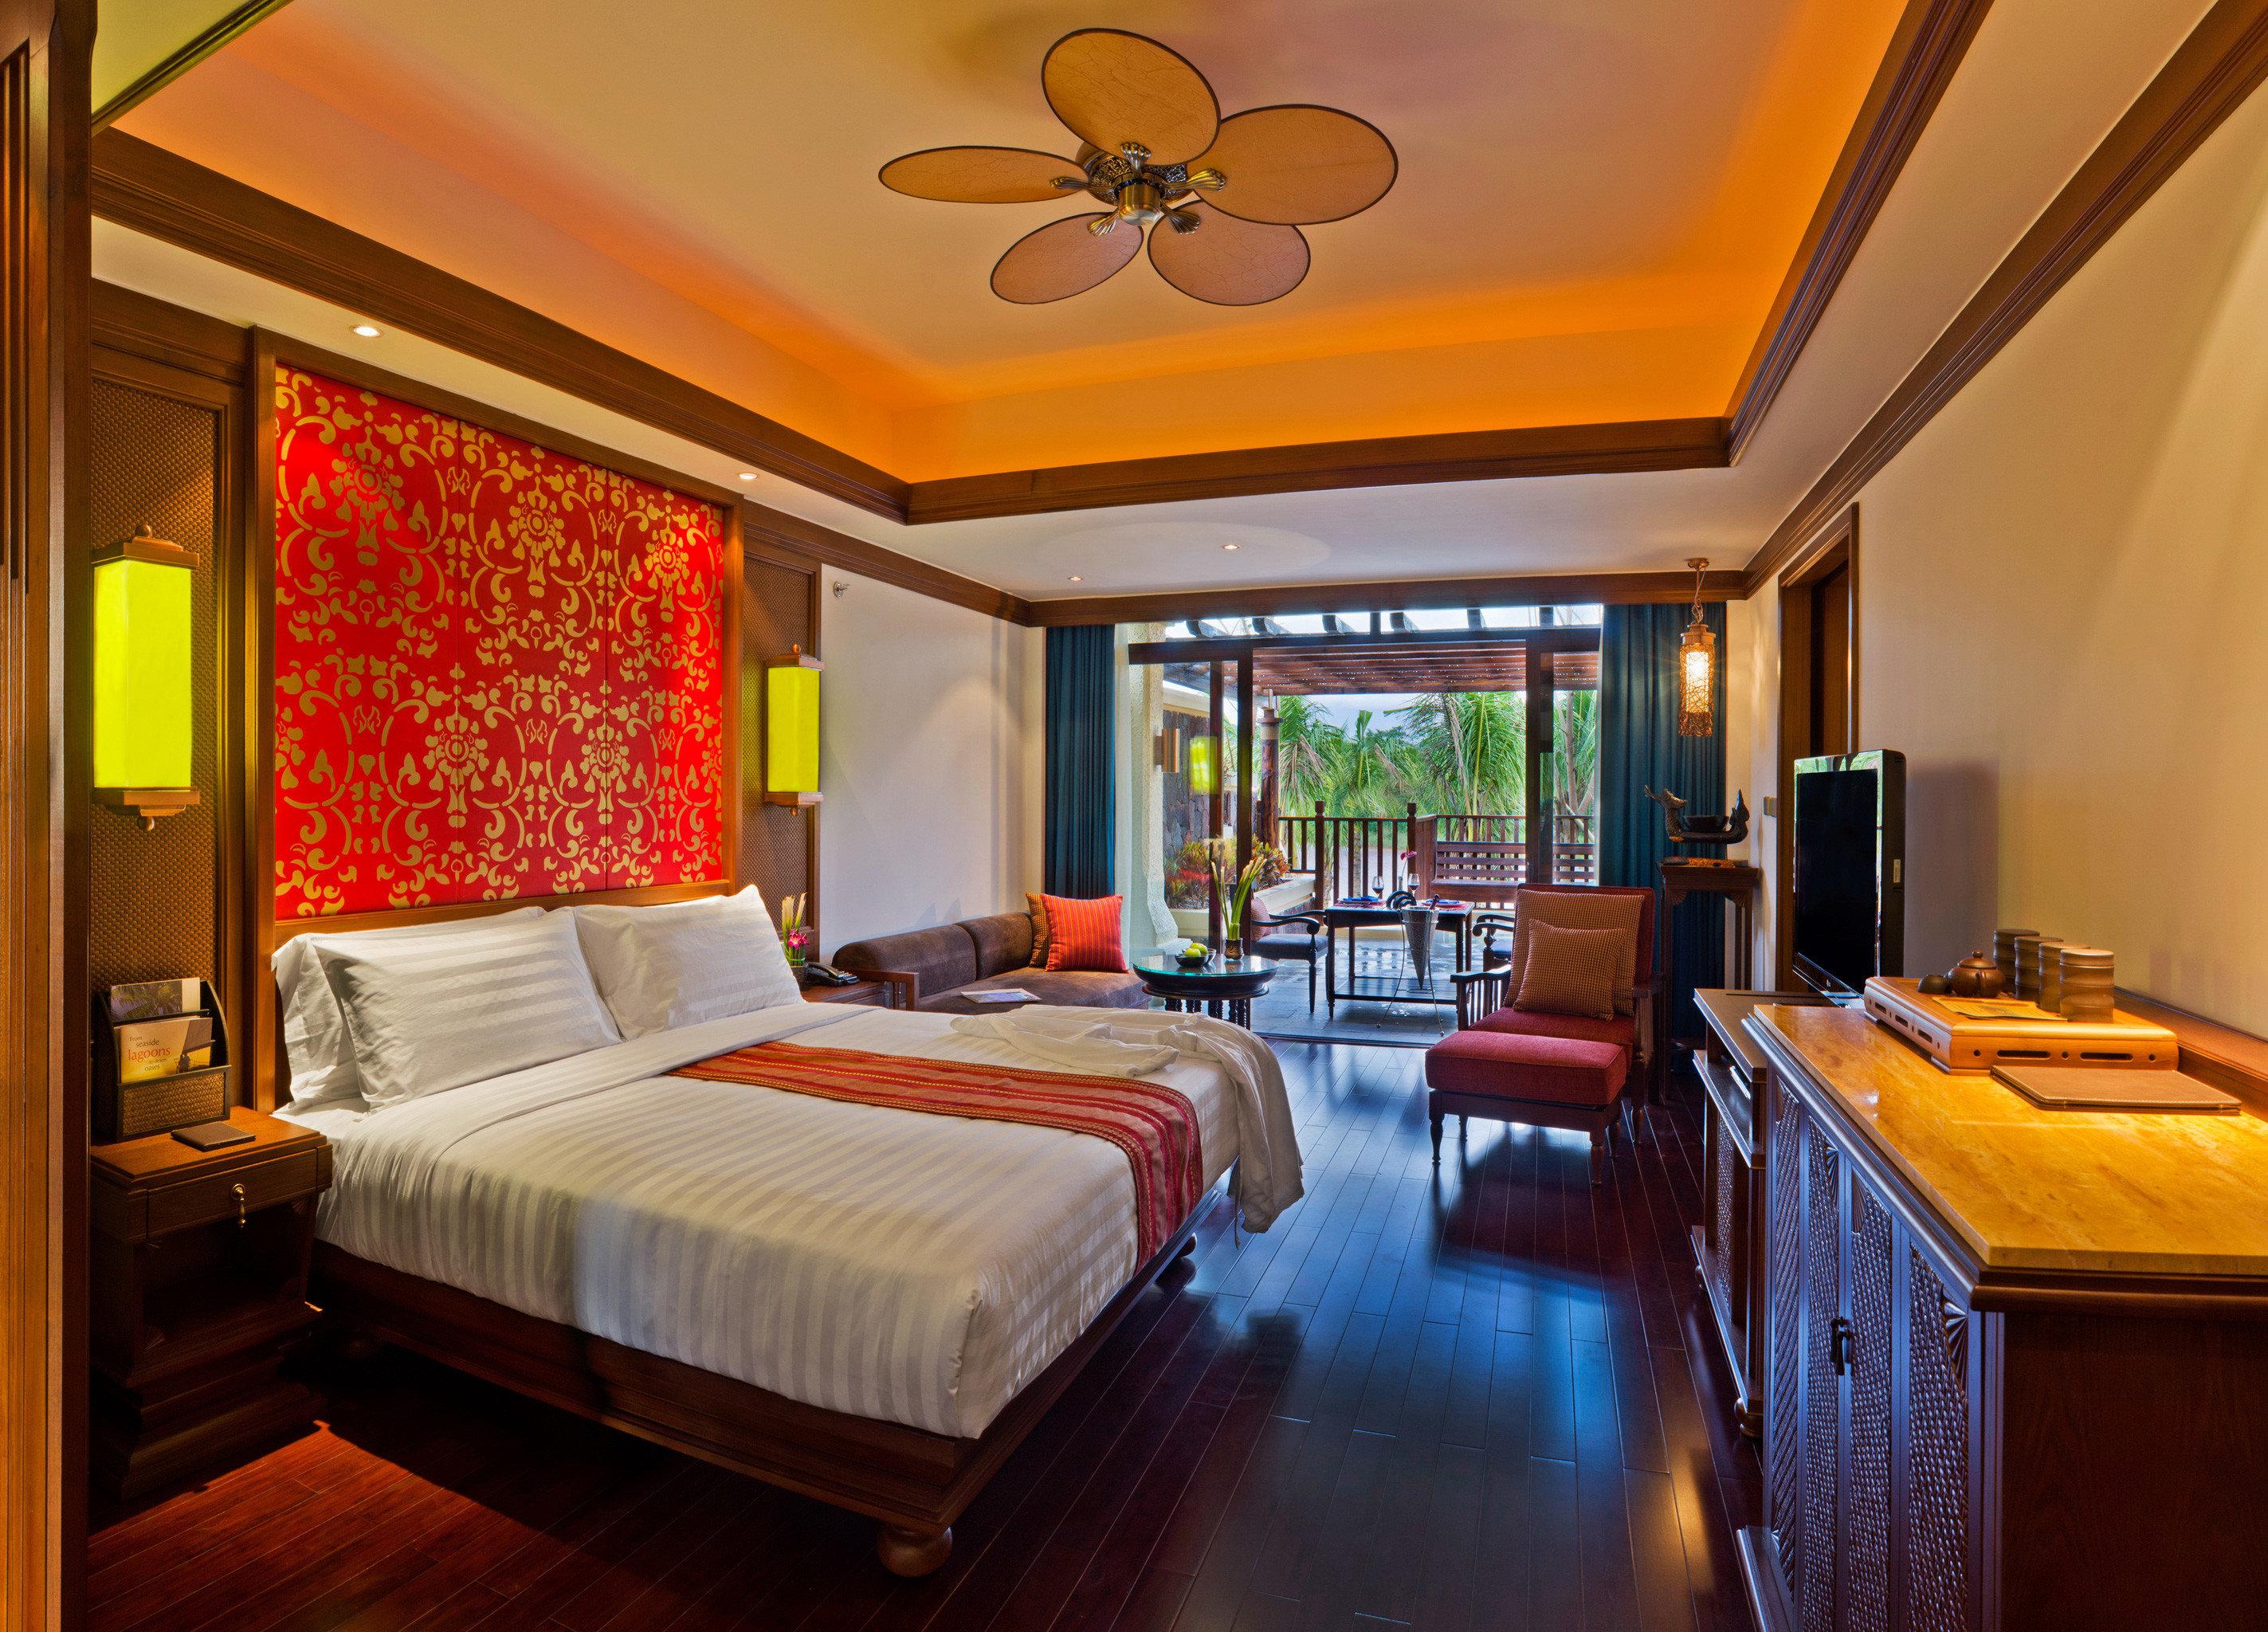 Balcony Bedroom Lounge Scenic views Suite property Resort home cottage living room Villa